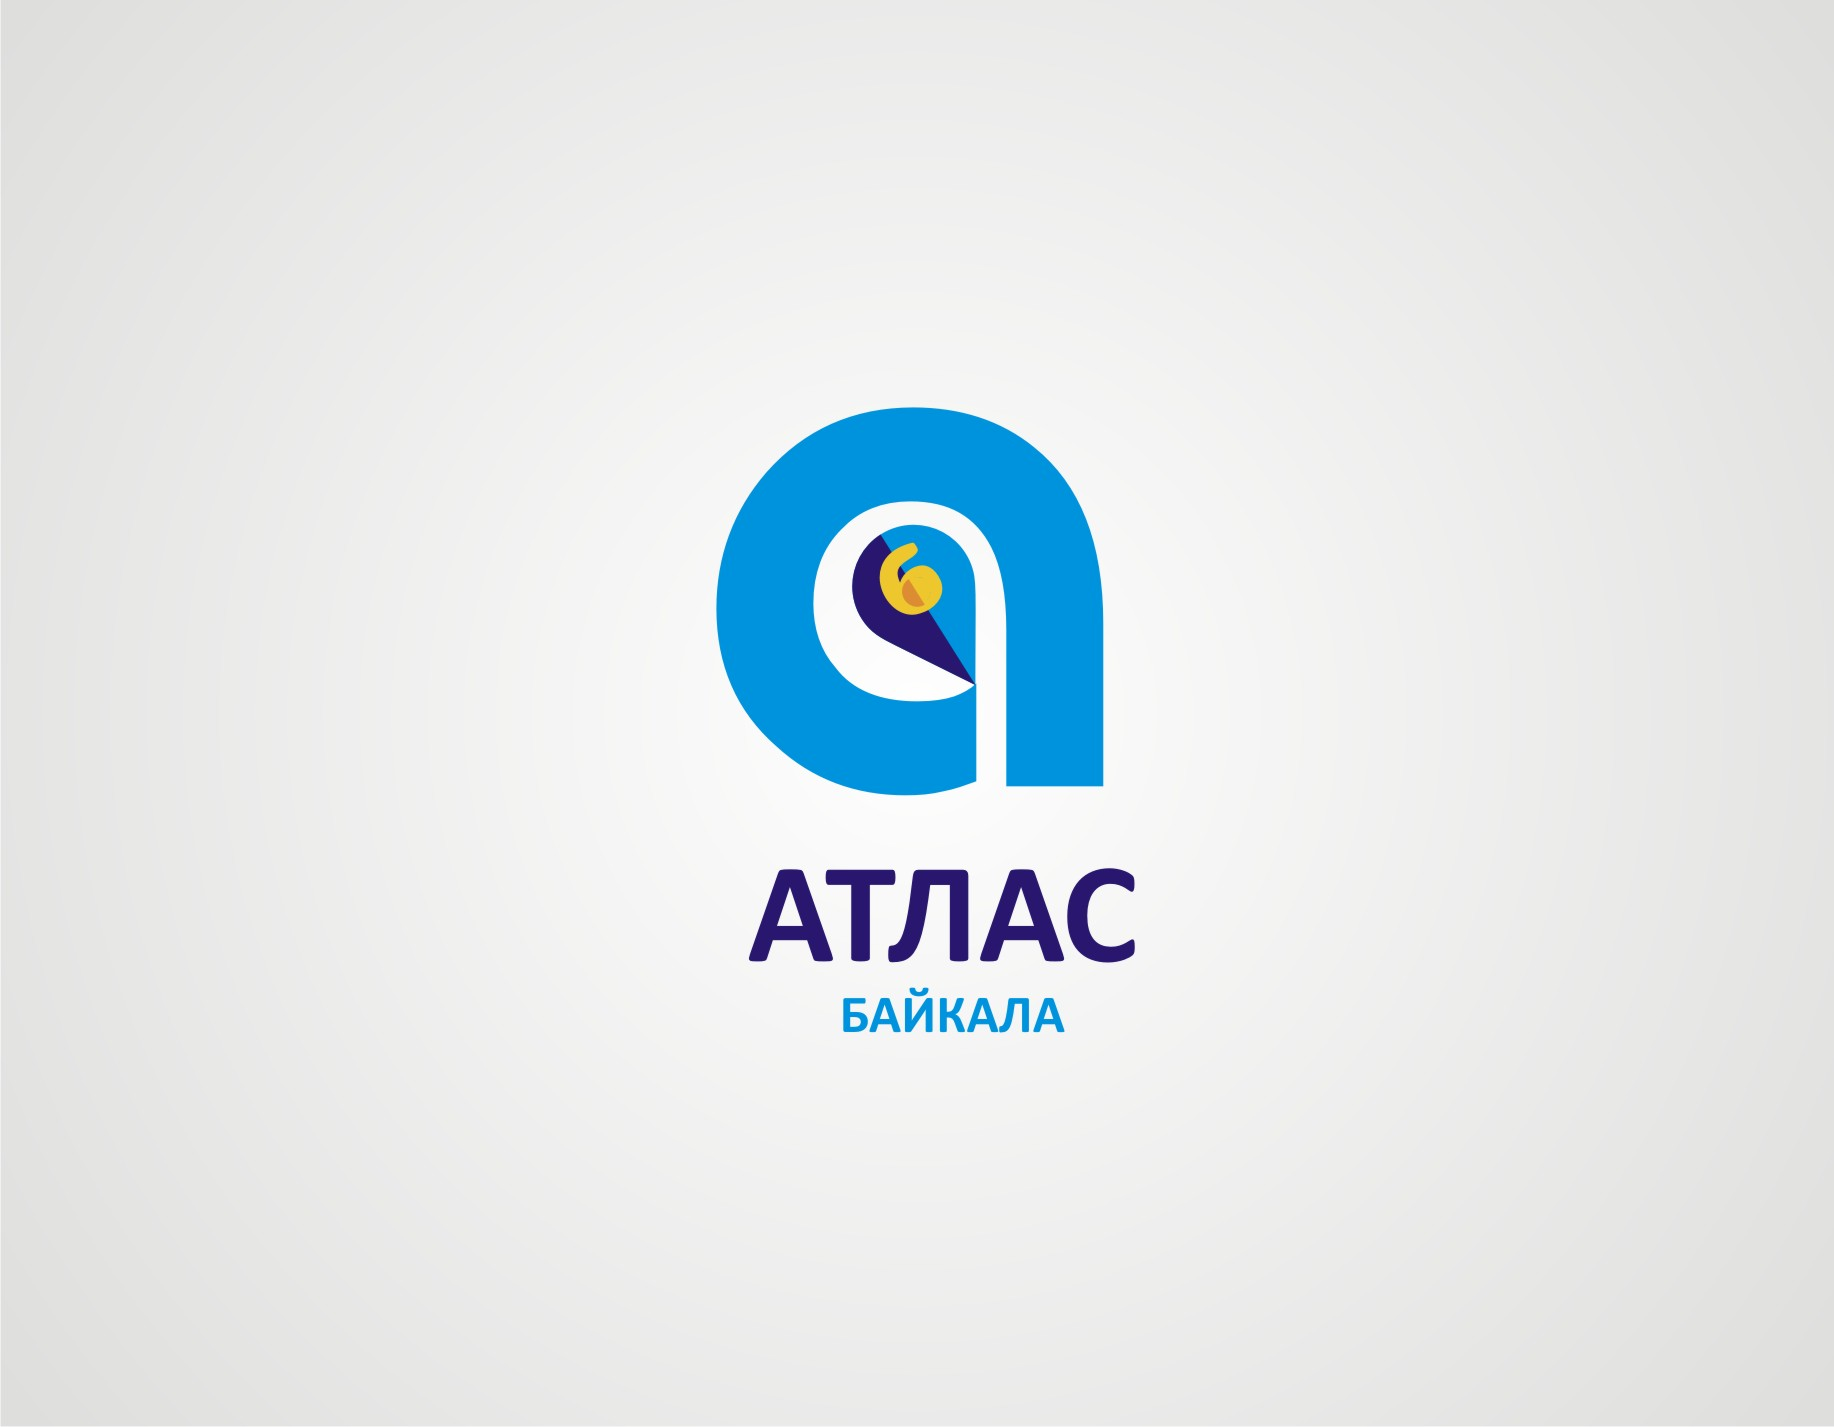 Разработка логотипа Атлас Байкала фото f_1385b19afc289f3b.jpg